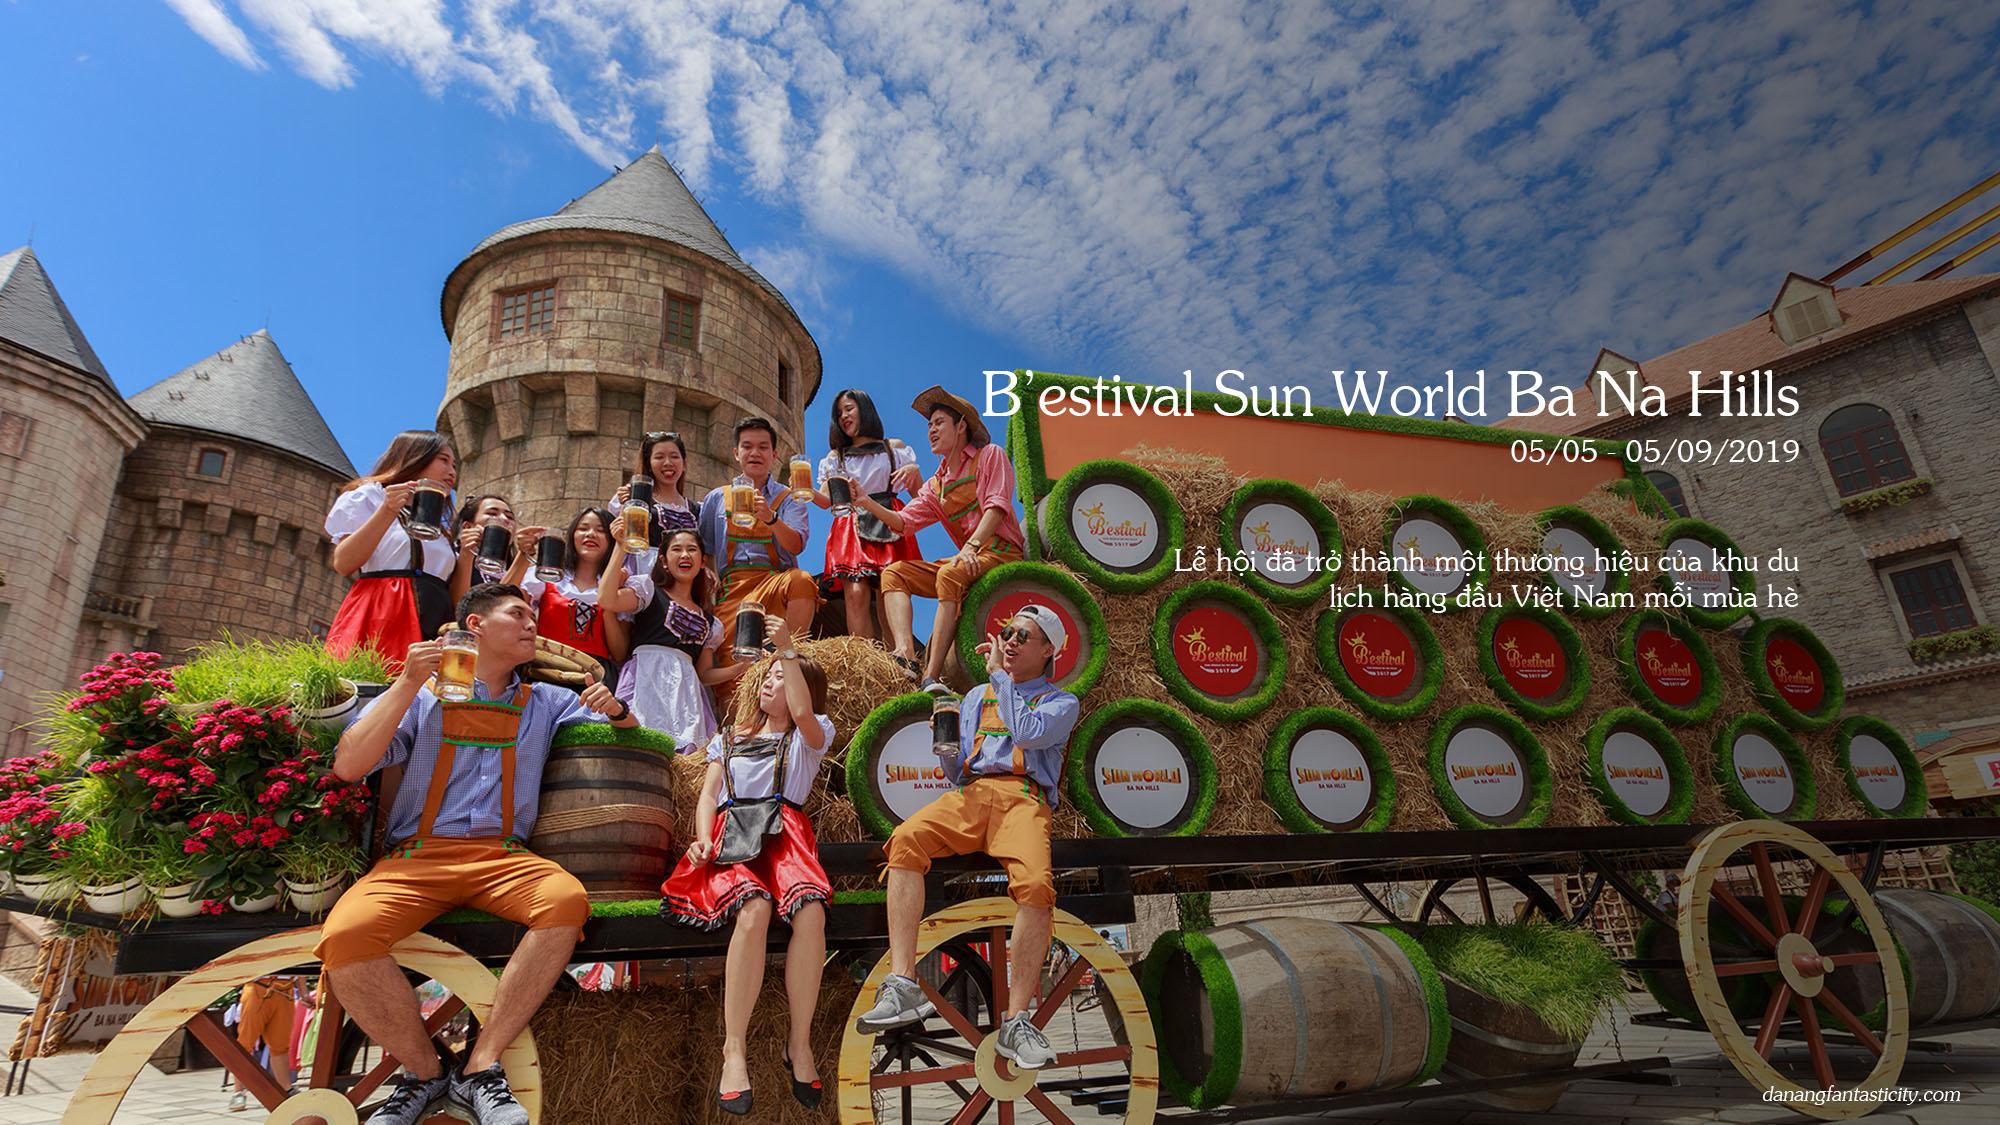 Le Hoi Bia Bestival Sun World Ba Na Hills Danang Fantasticity 03